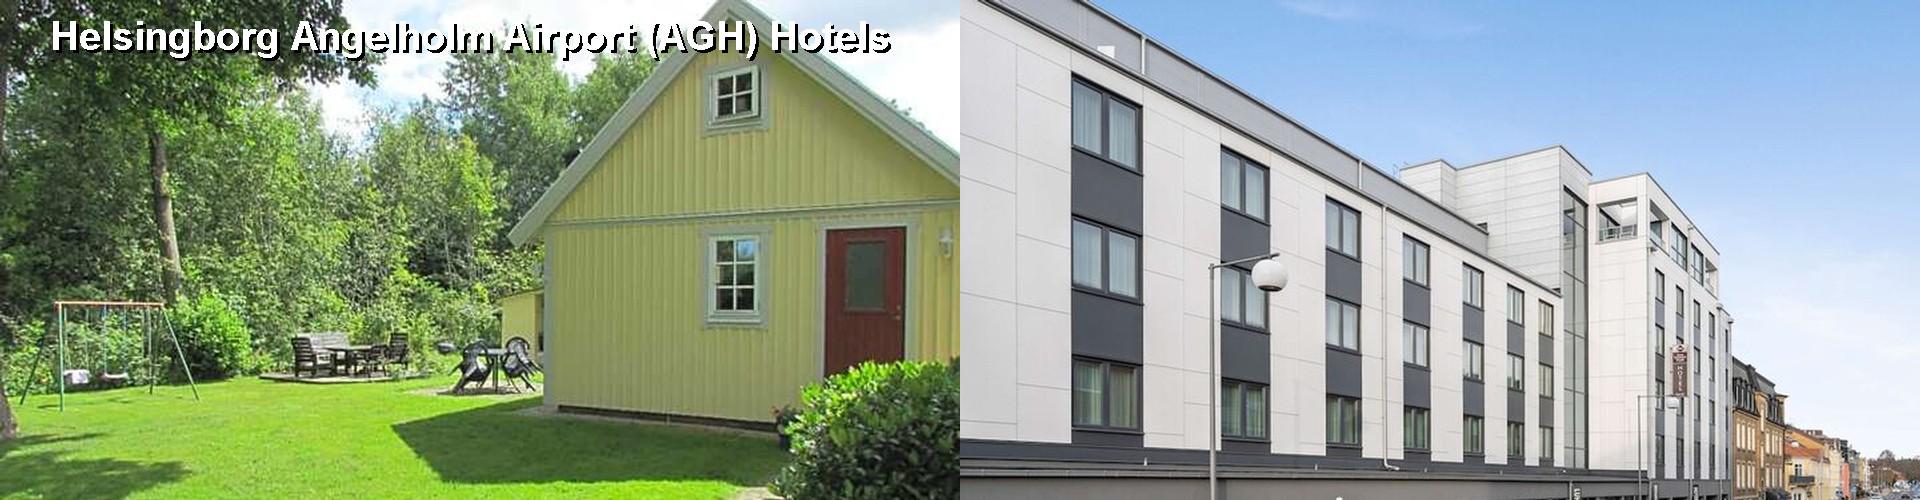 Hotels Near Helsingborg Angelholm Airport Agh In Baastad